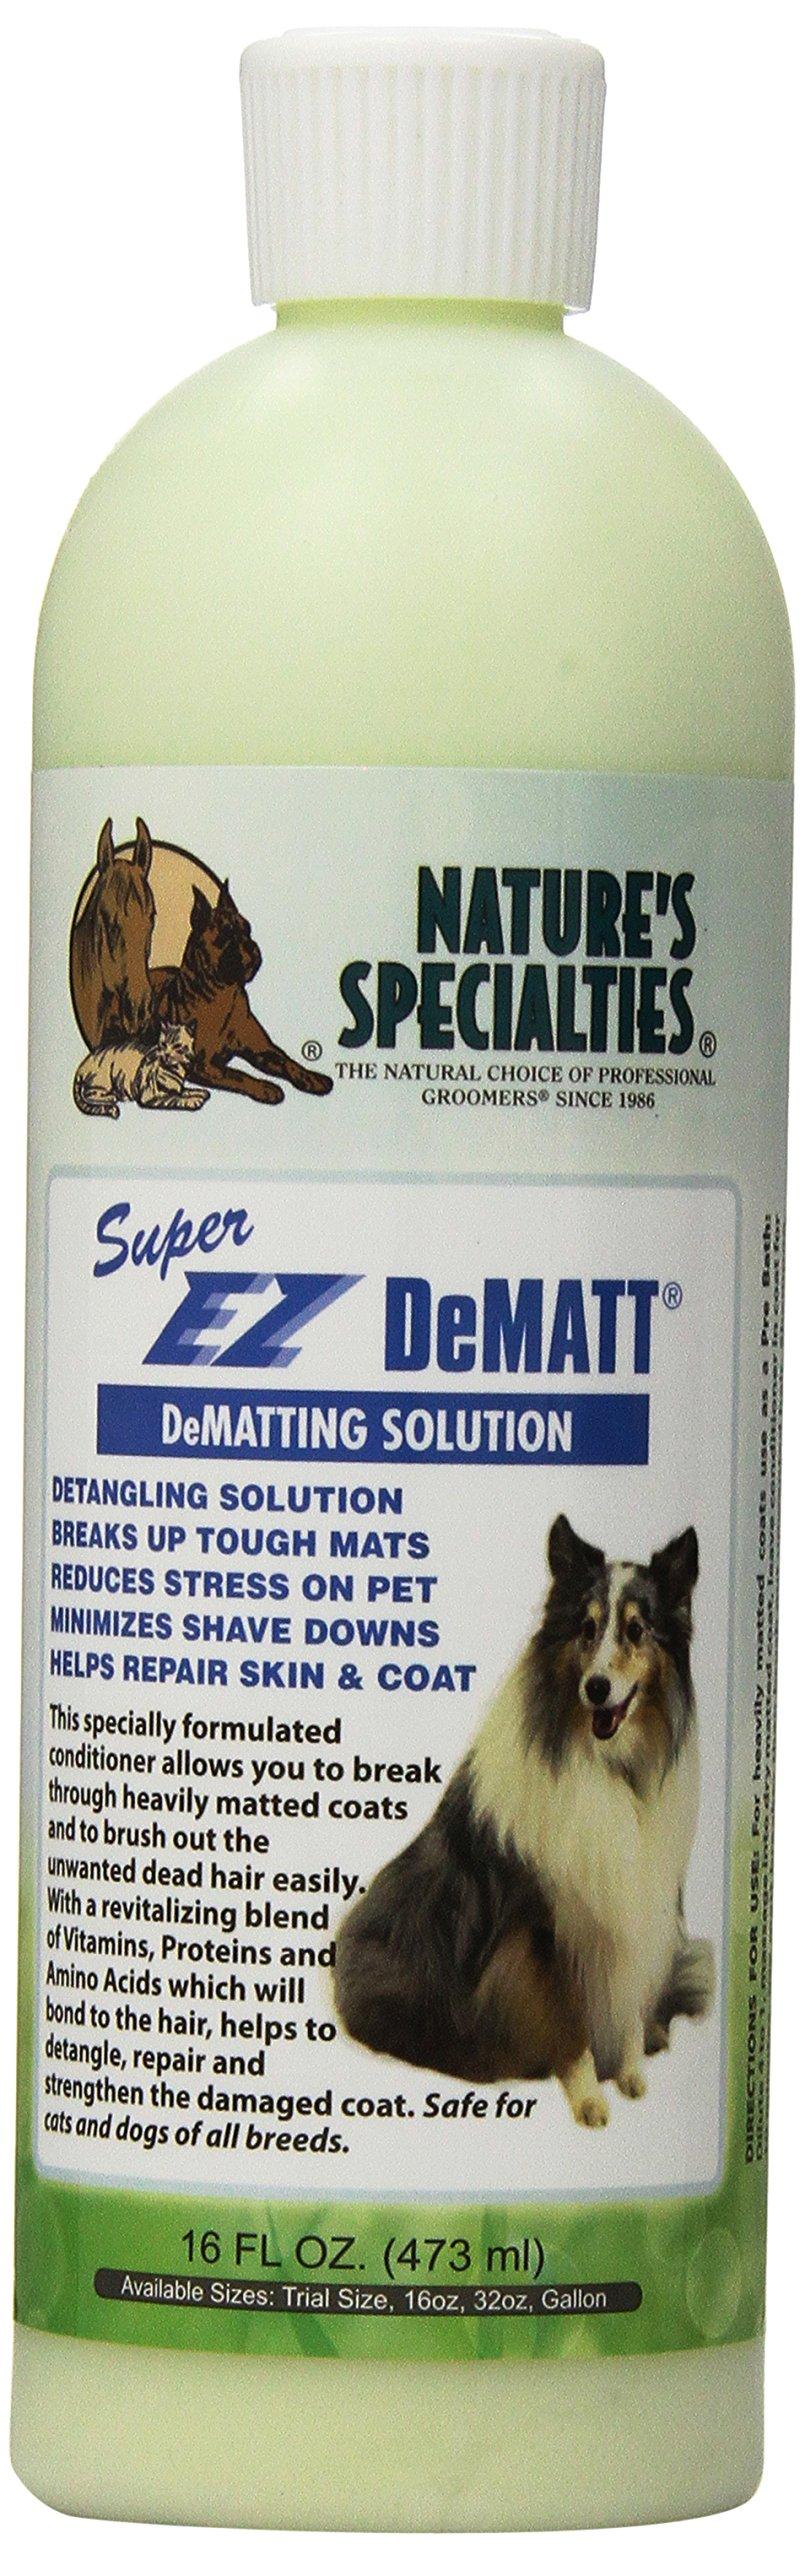 Nature's Specialties Super EZ Dematt Pet Conditioner, 16-Ounce by Nature's Specialties Mfg